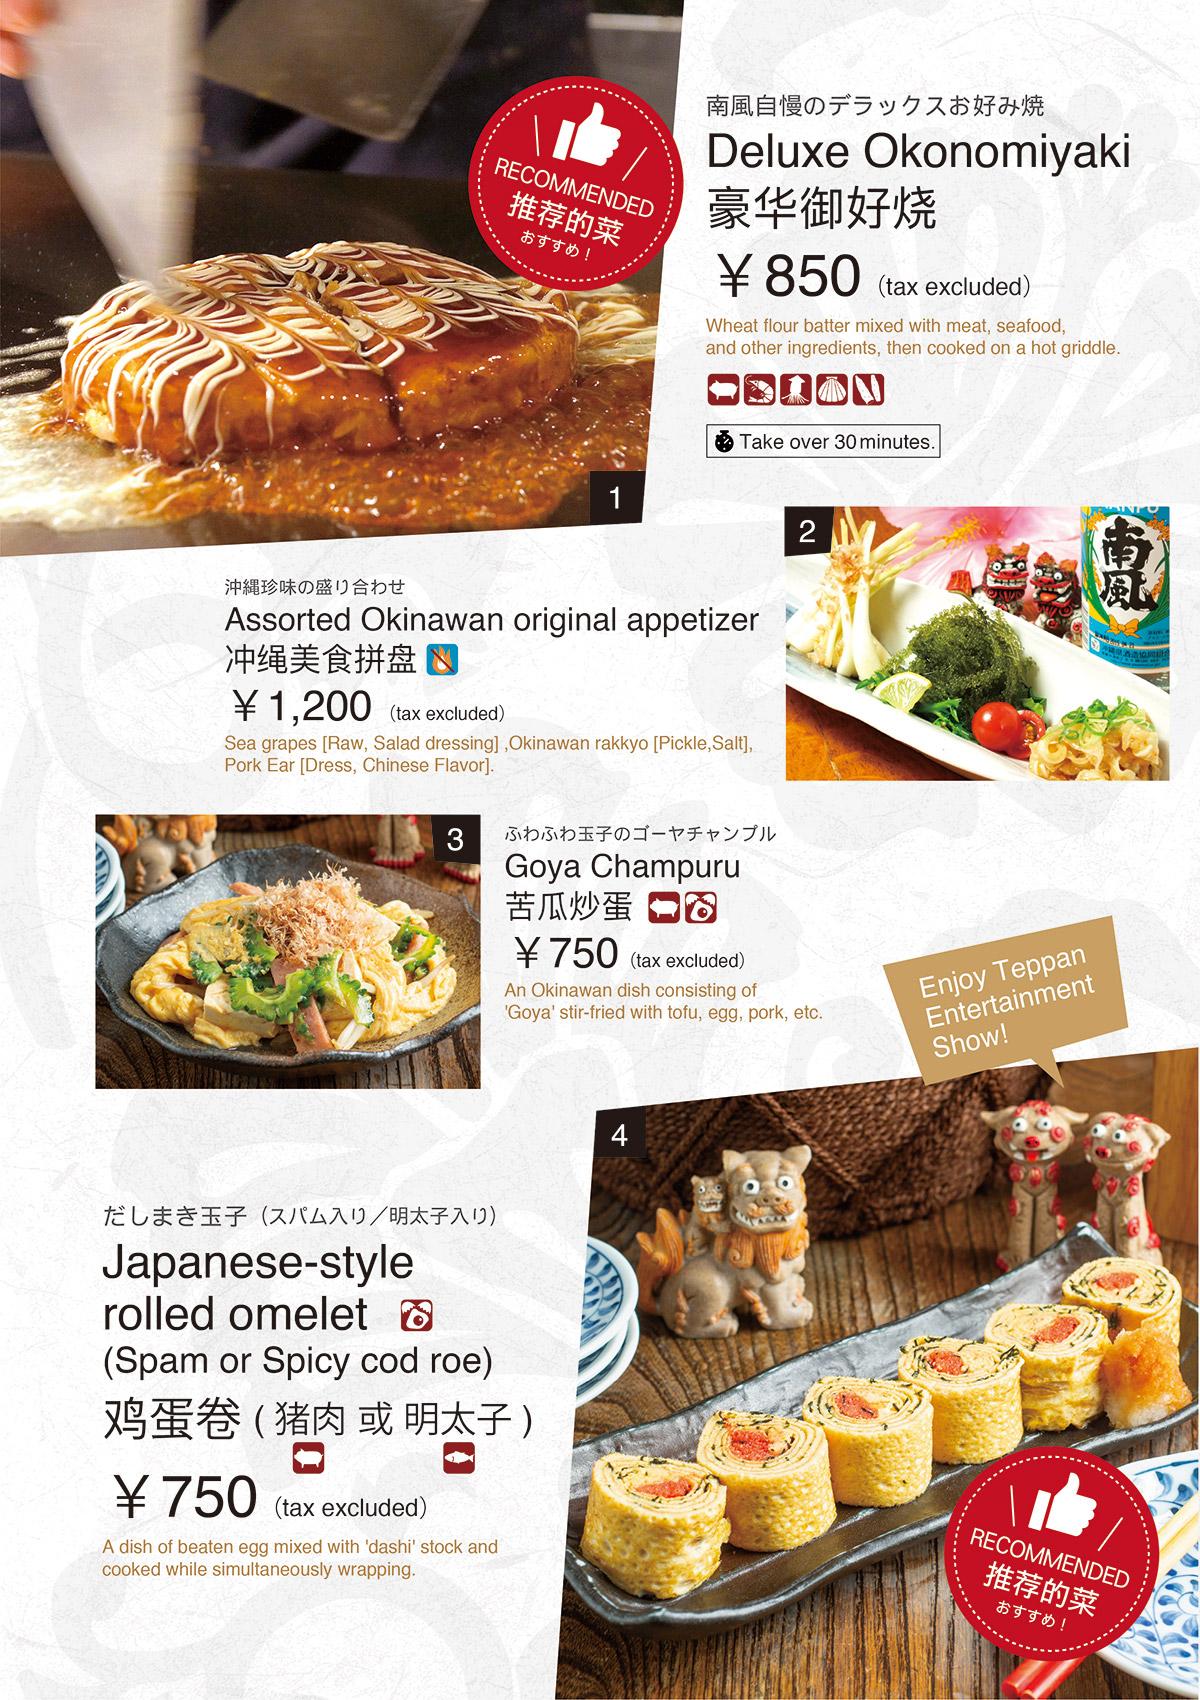 MENU ◆ 菜单